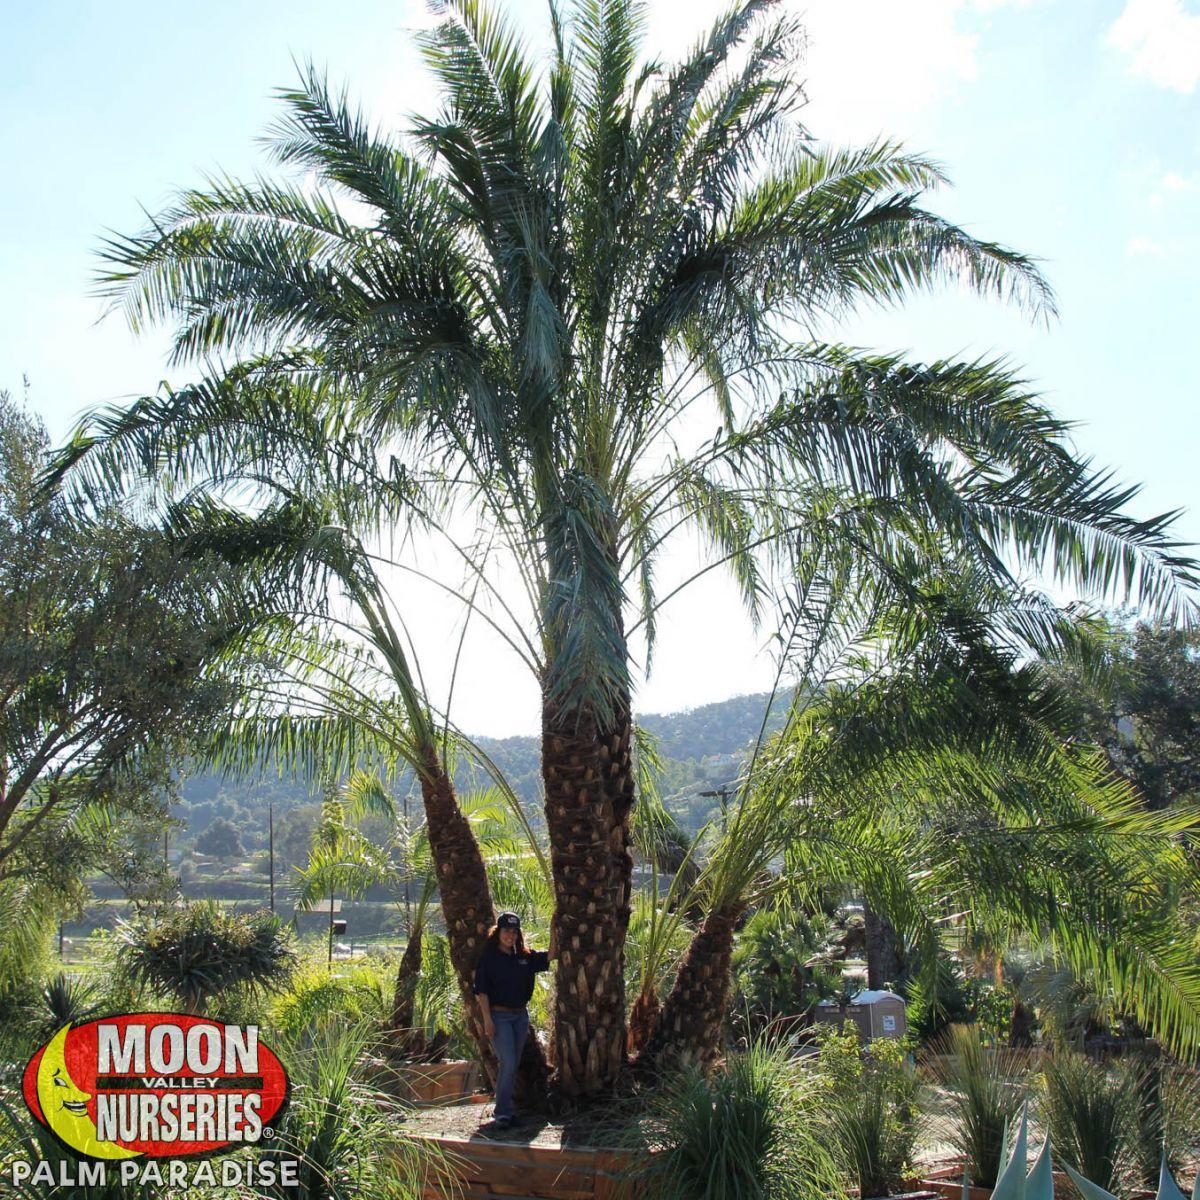 Senegal Date Palm Palm Tree Palm Paradise Nursery